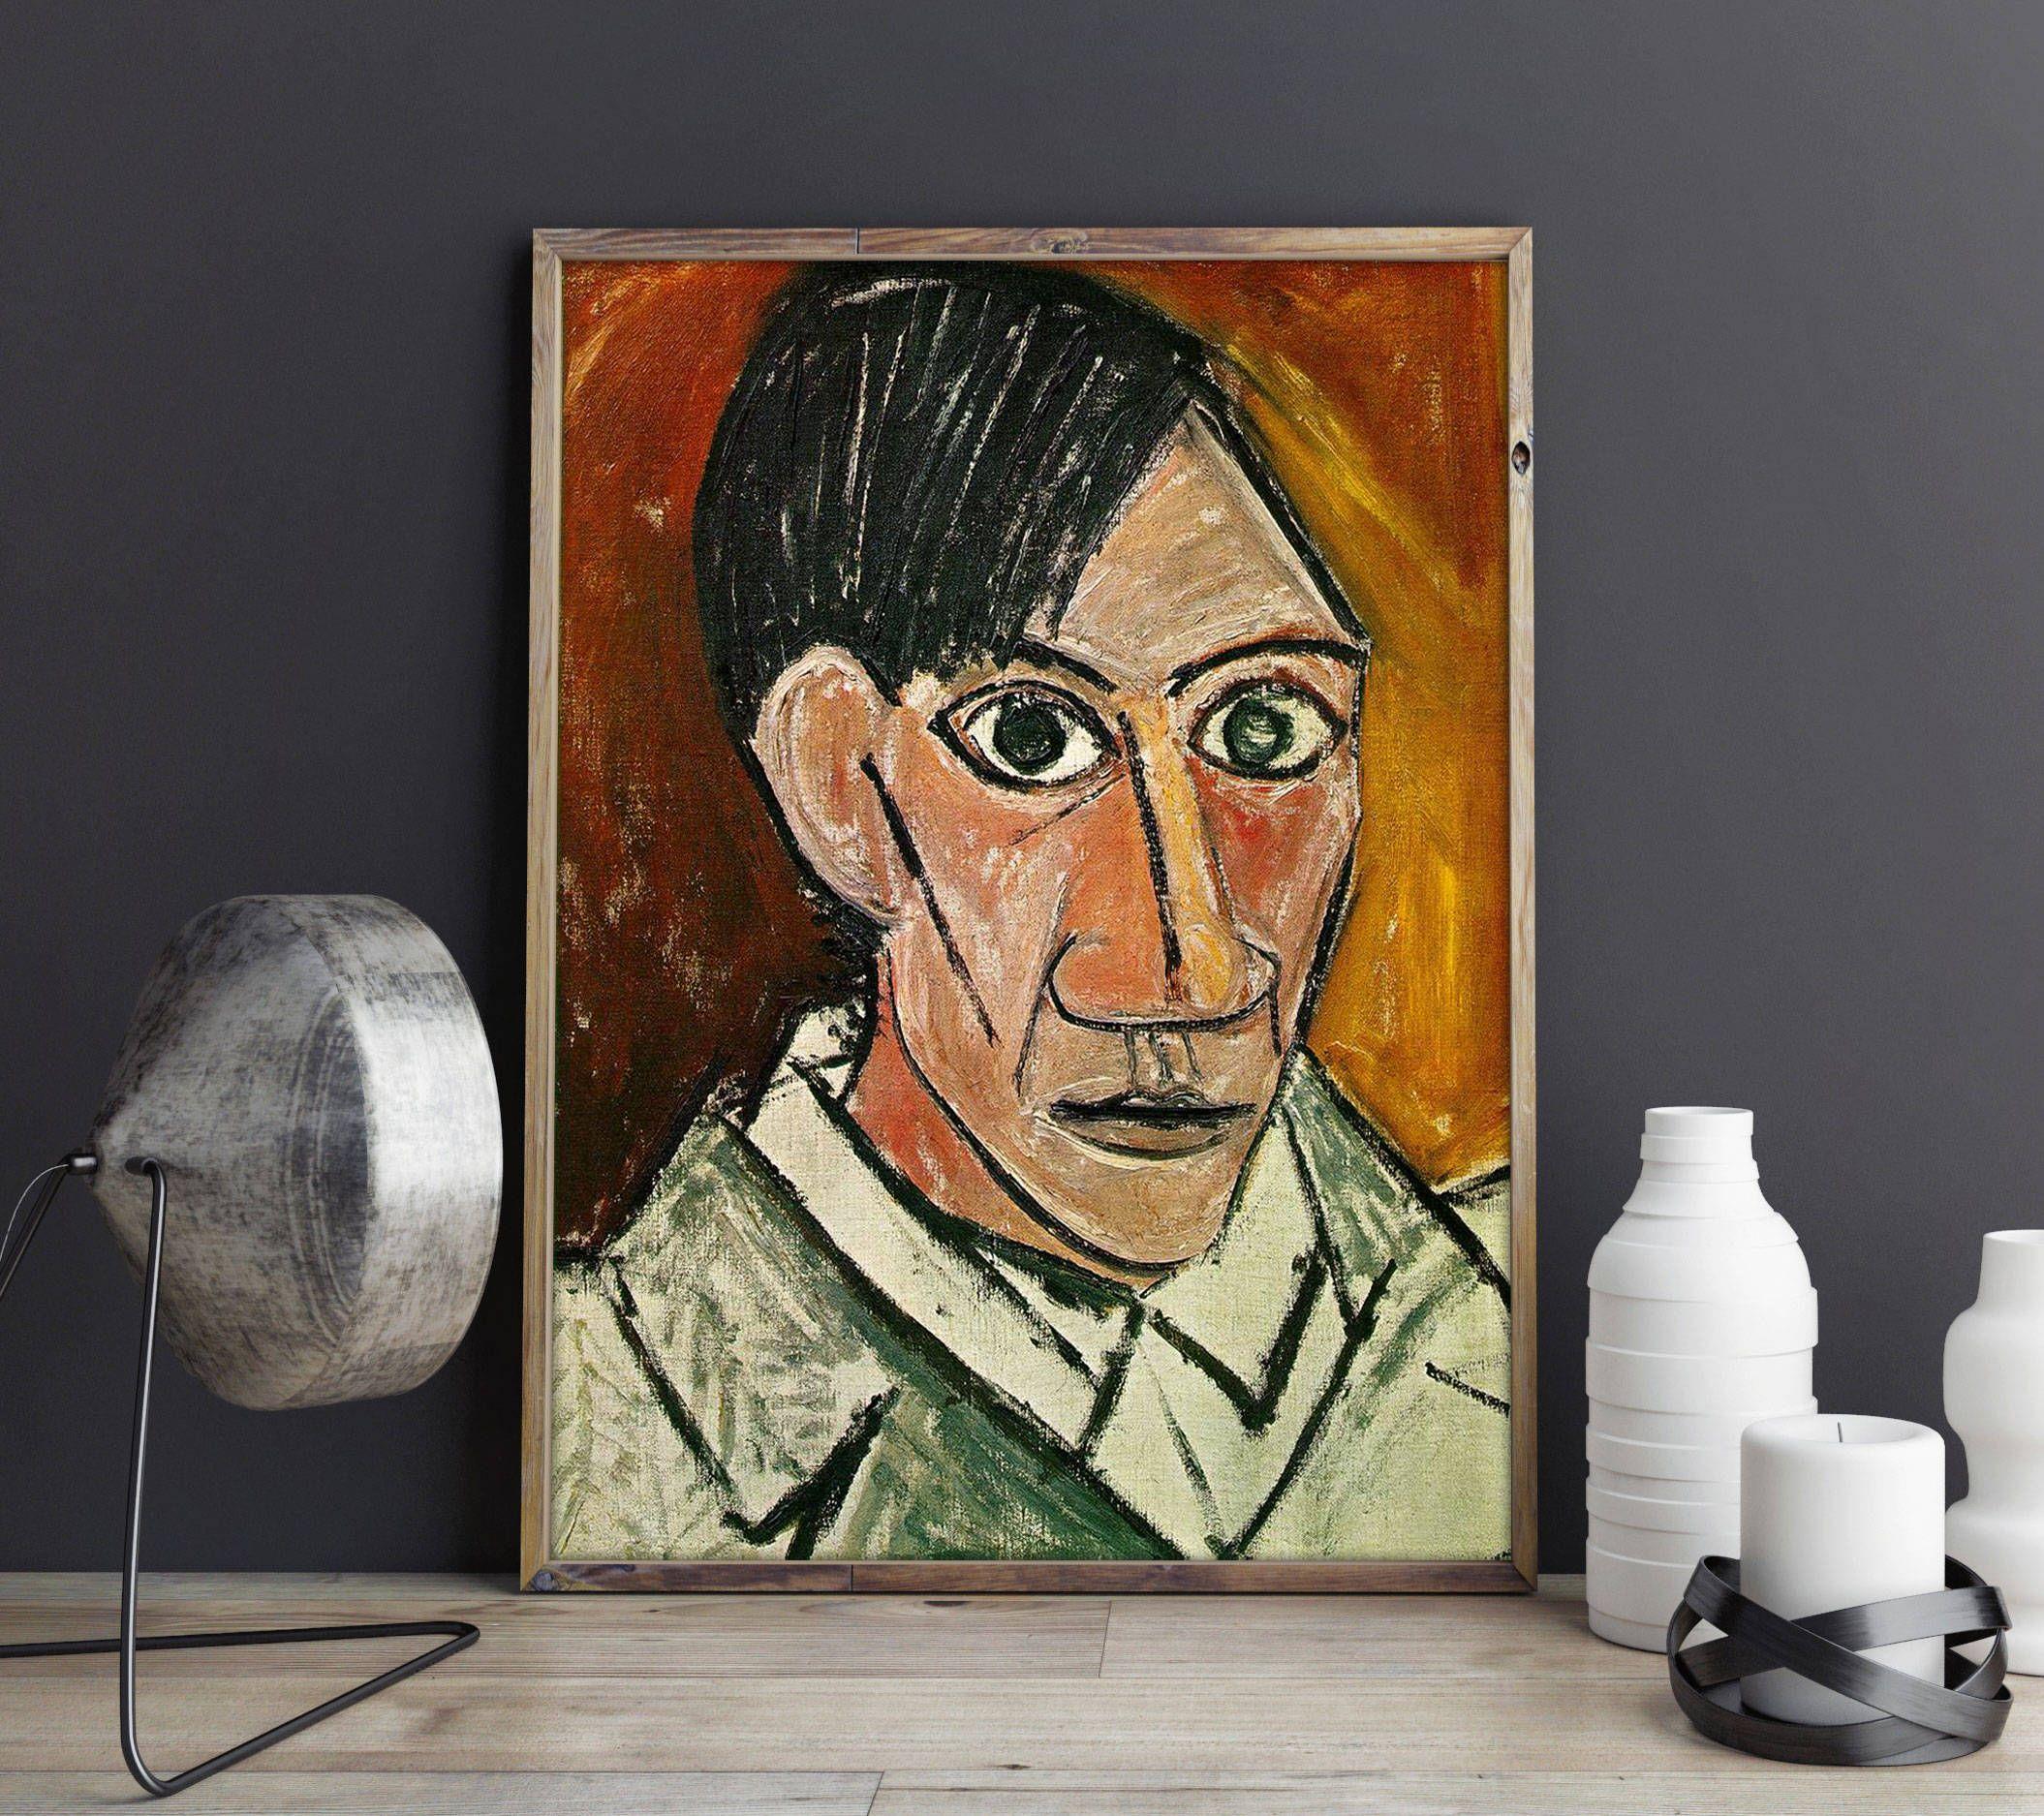 Picasso Painting Picasso Self Portrait 1907 Pablo Picasso ...